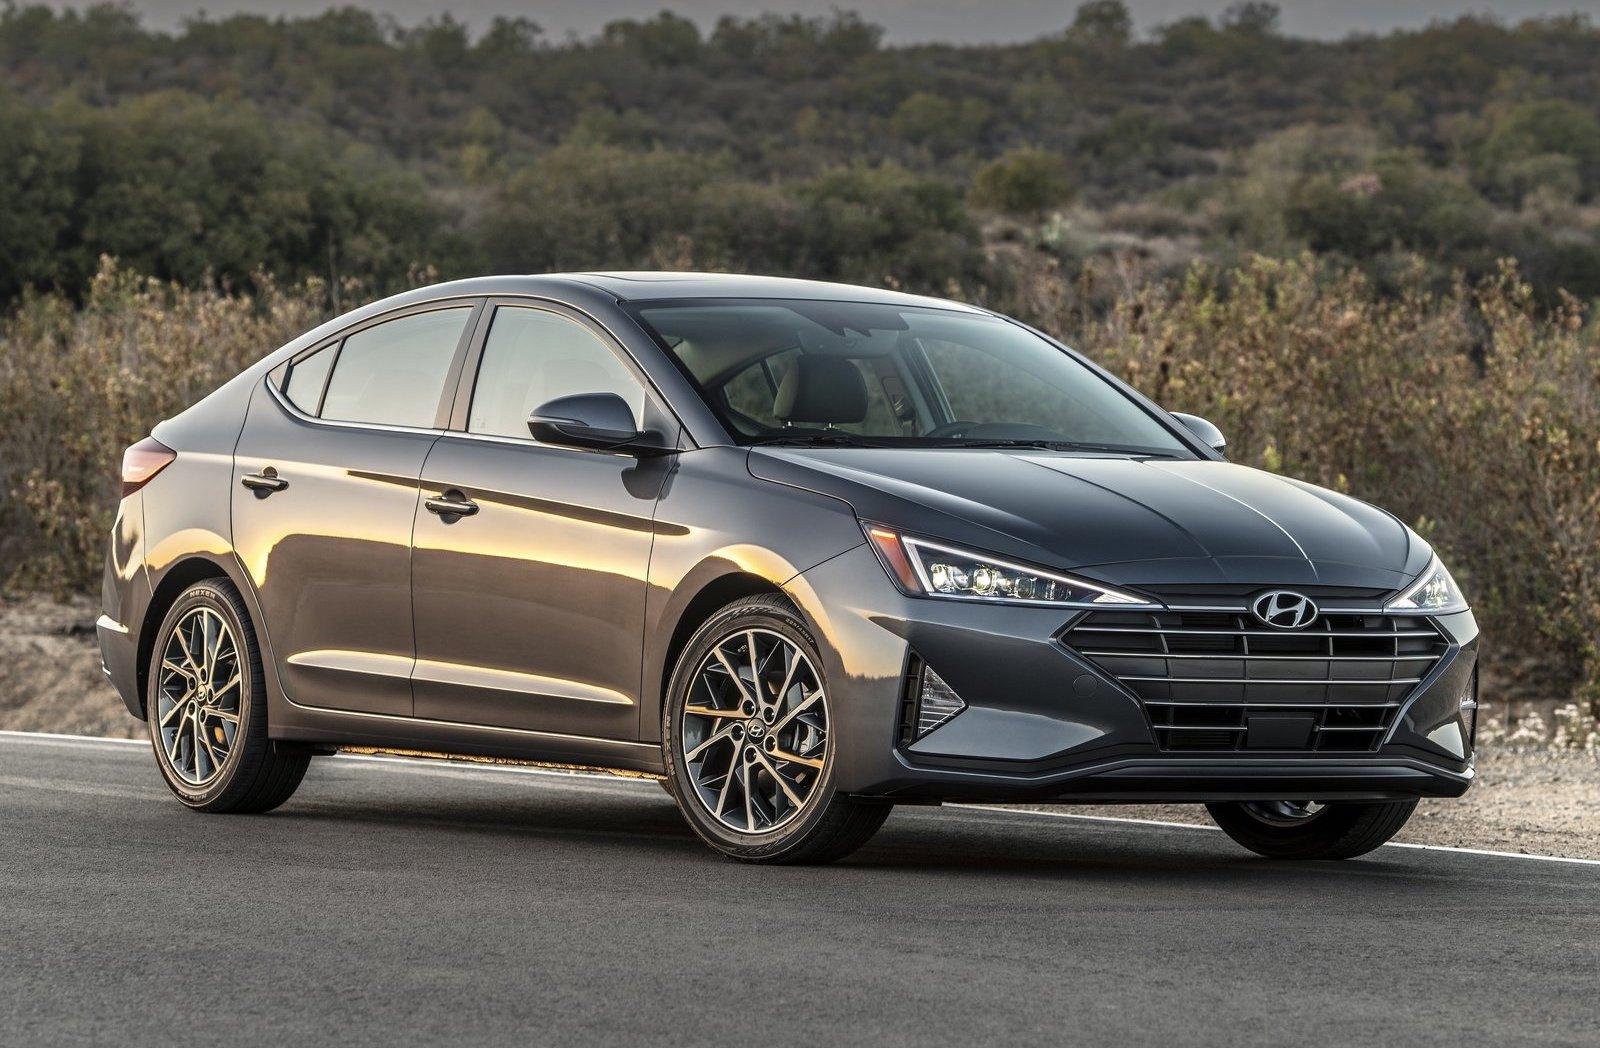 2019 Hyundai Elantra revealed in North America | PerformanceDrive